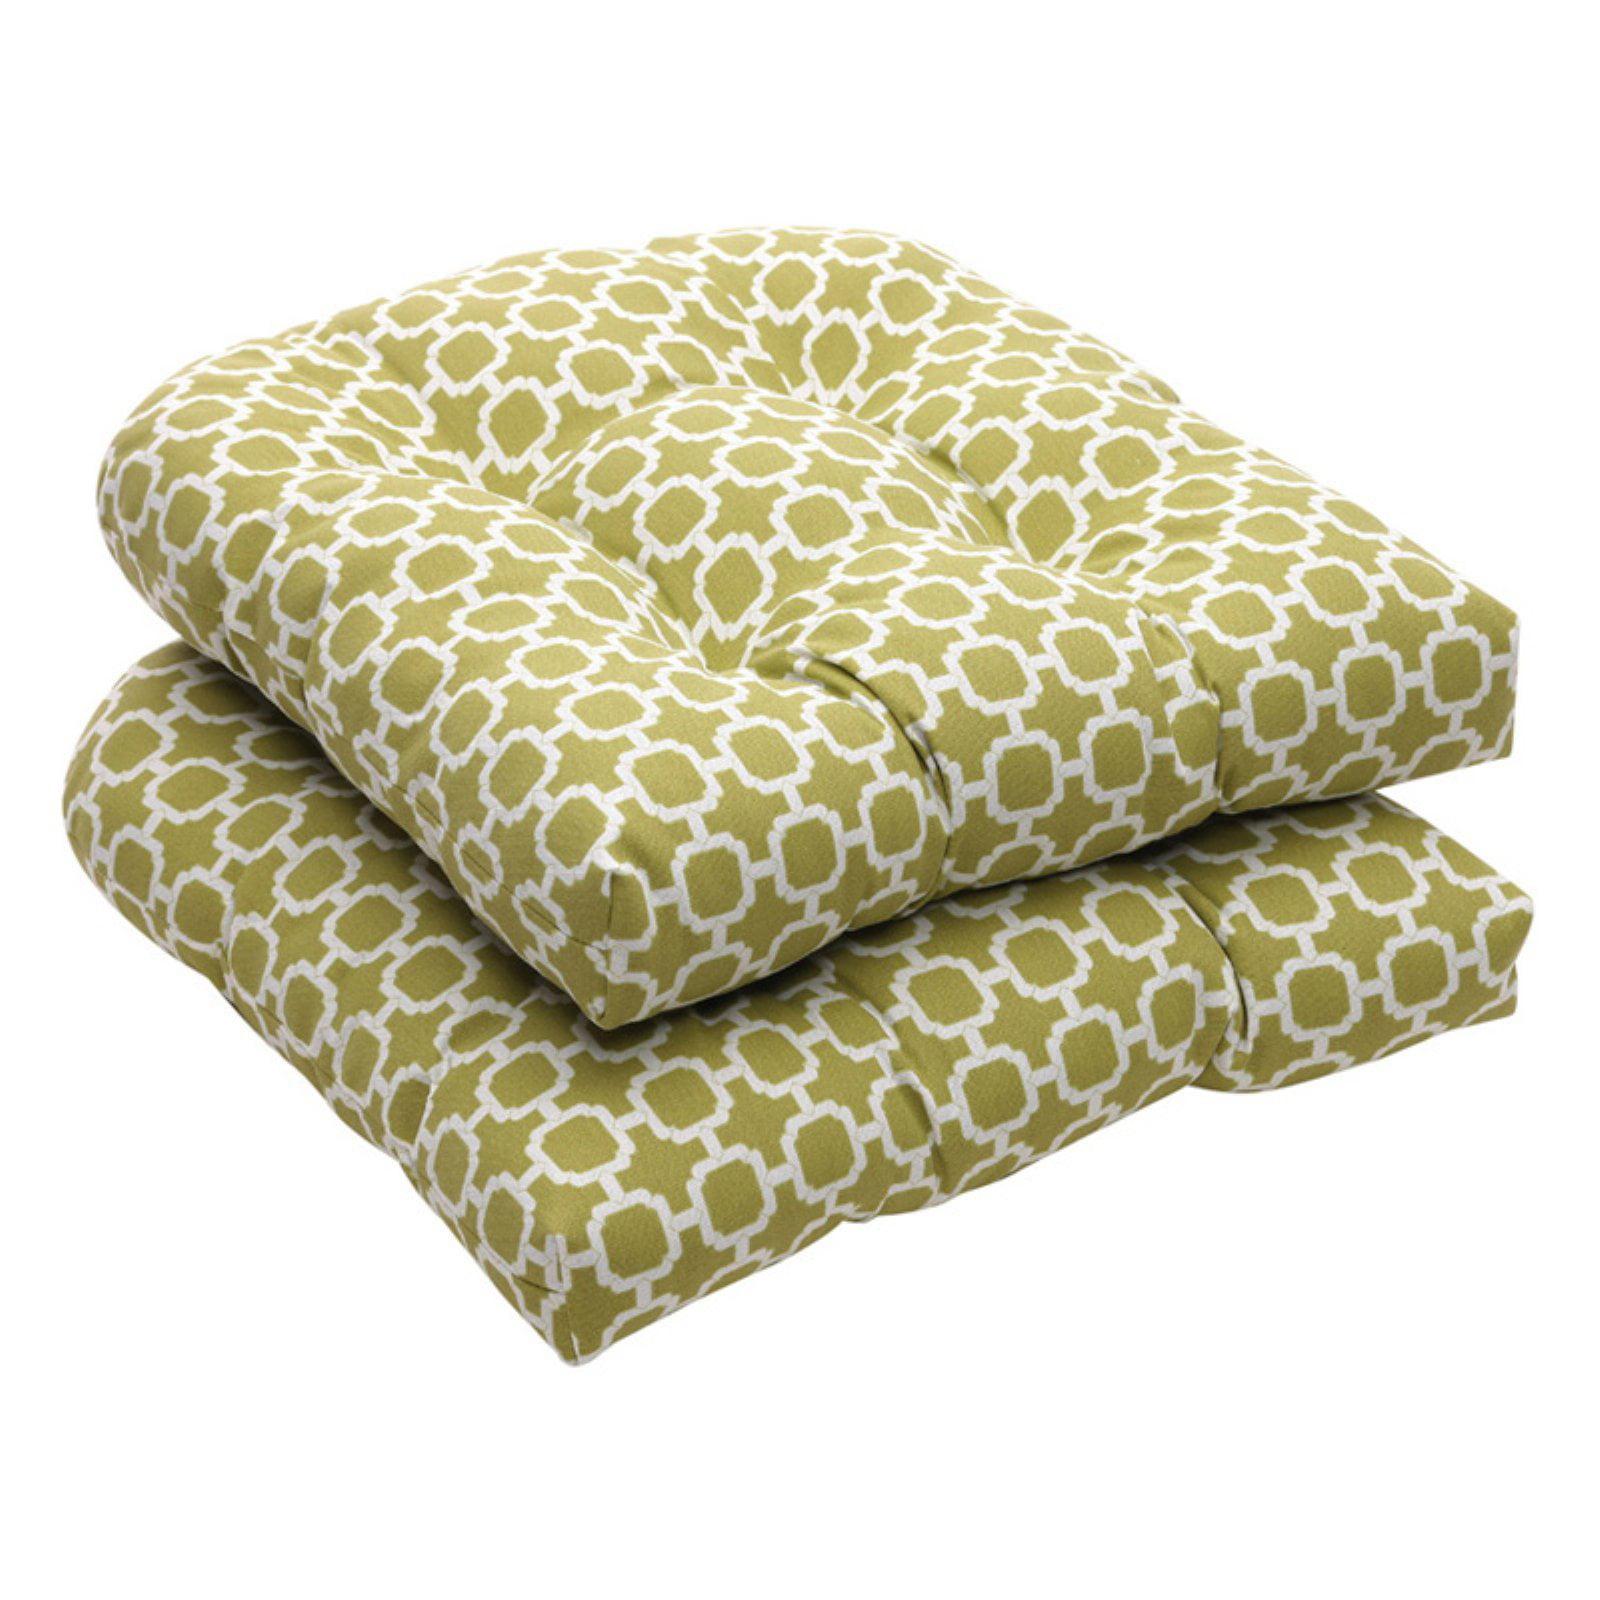 Pillow Perfect Geometric Print Outdoor Wicker Seat Cushions - 19 x 19 x 5 in.